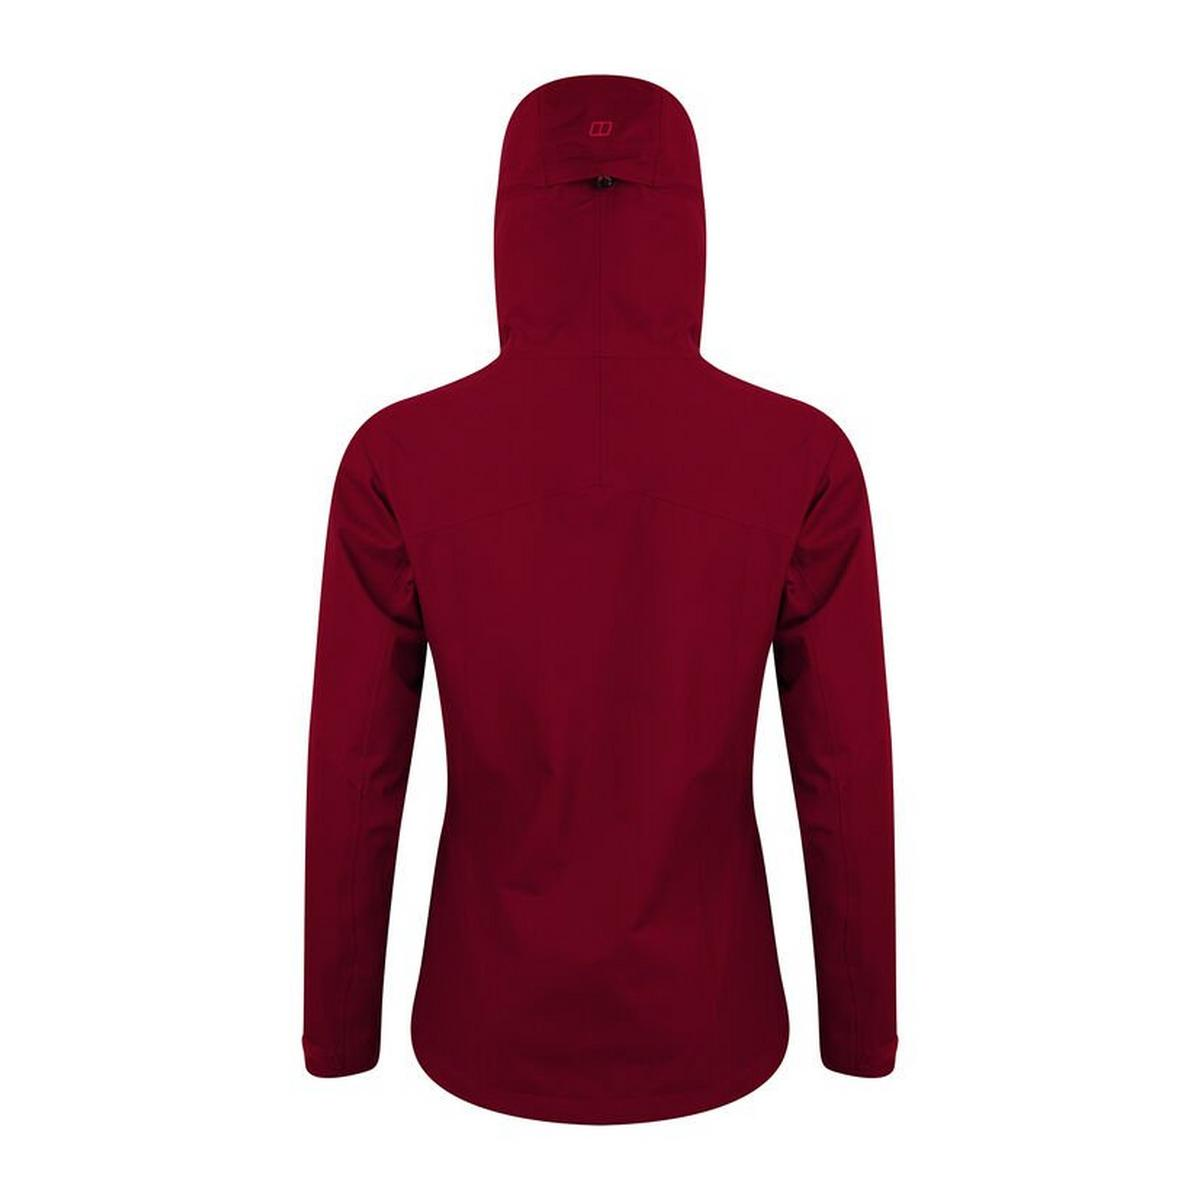 Berghaus Women's Fellmaster Waterproof Jacket - Red